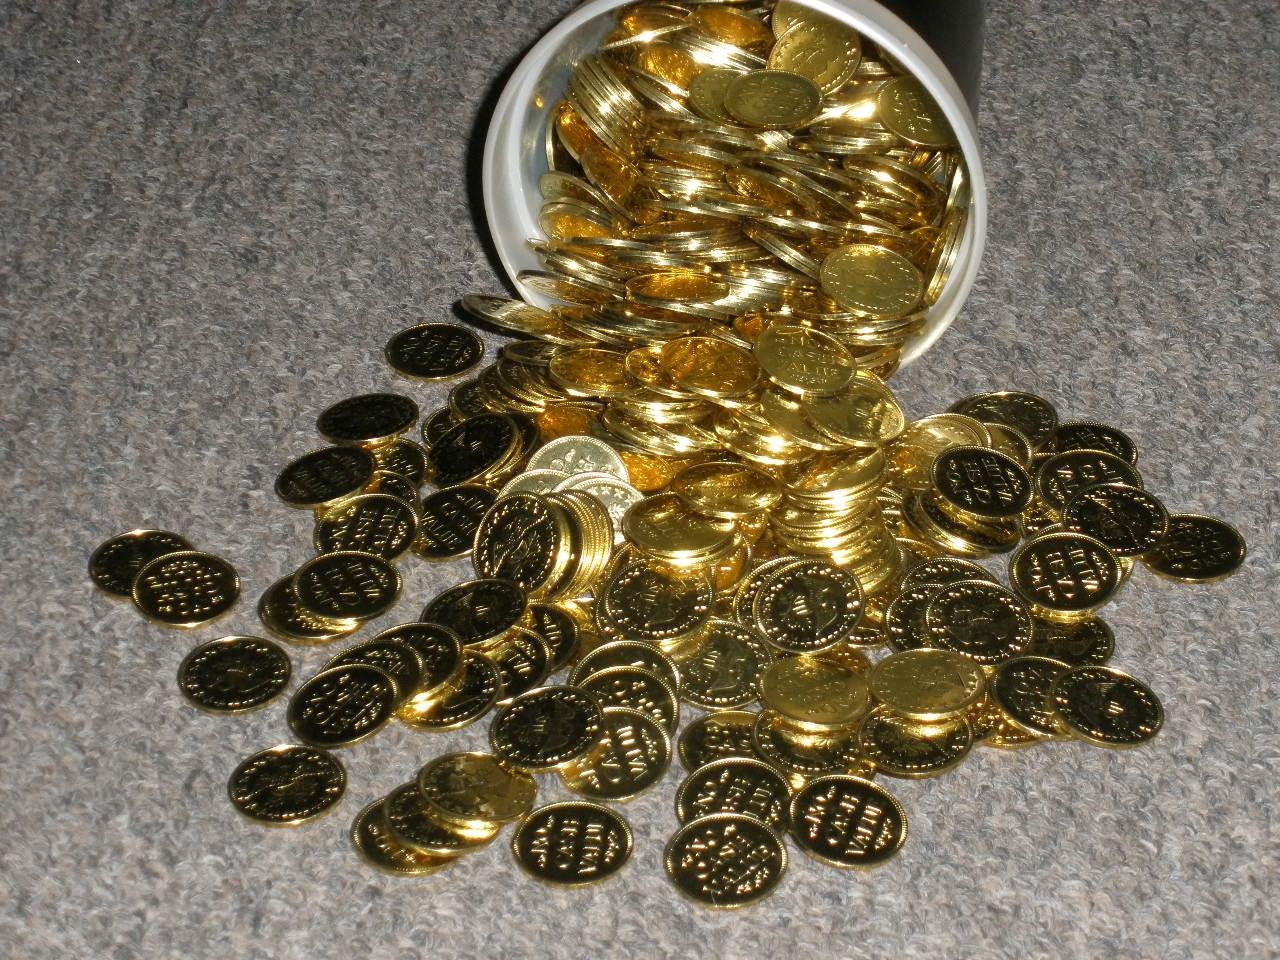 Slot Machine Quarter Size Tokens For Sale Gambler S